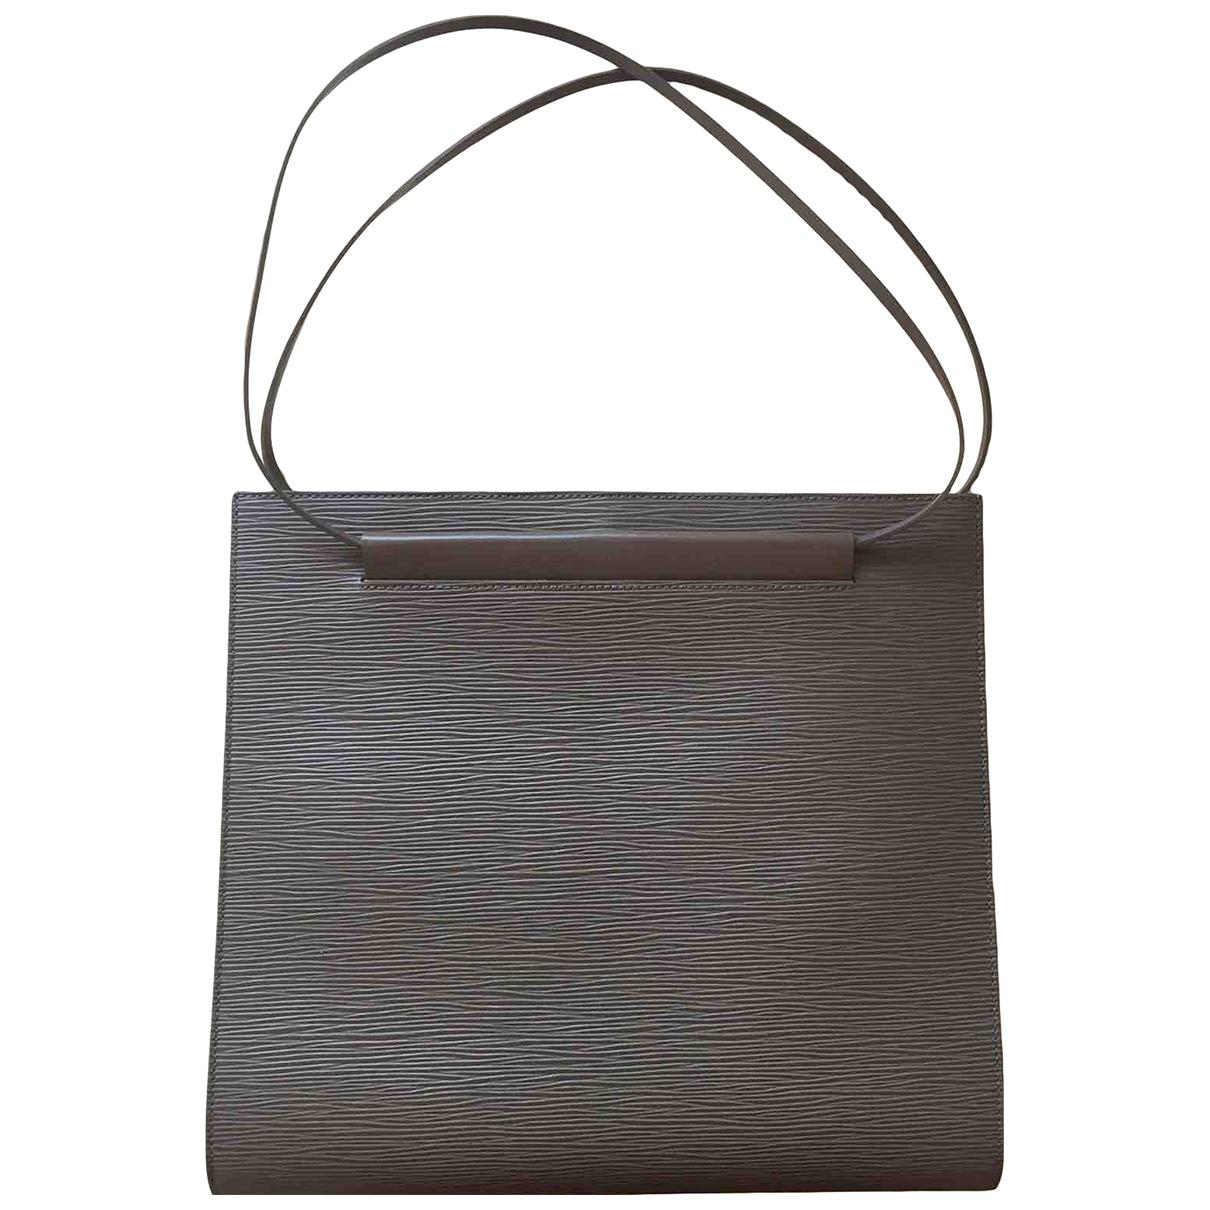 Louis Vuitton \N Anthracite Leather handbag for Women \N